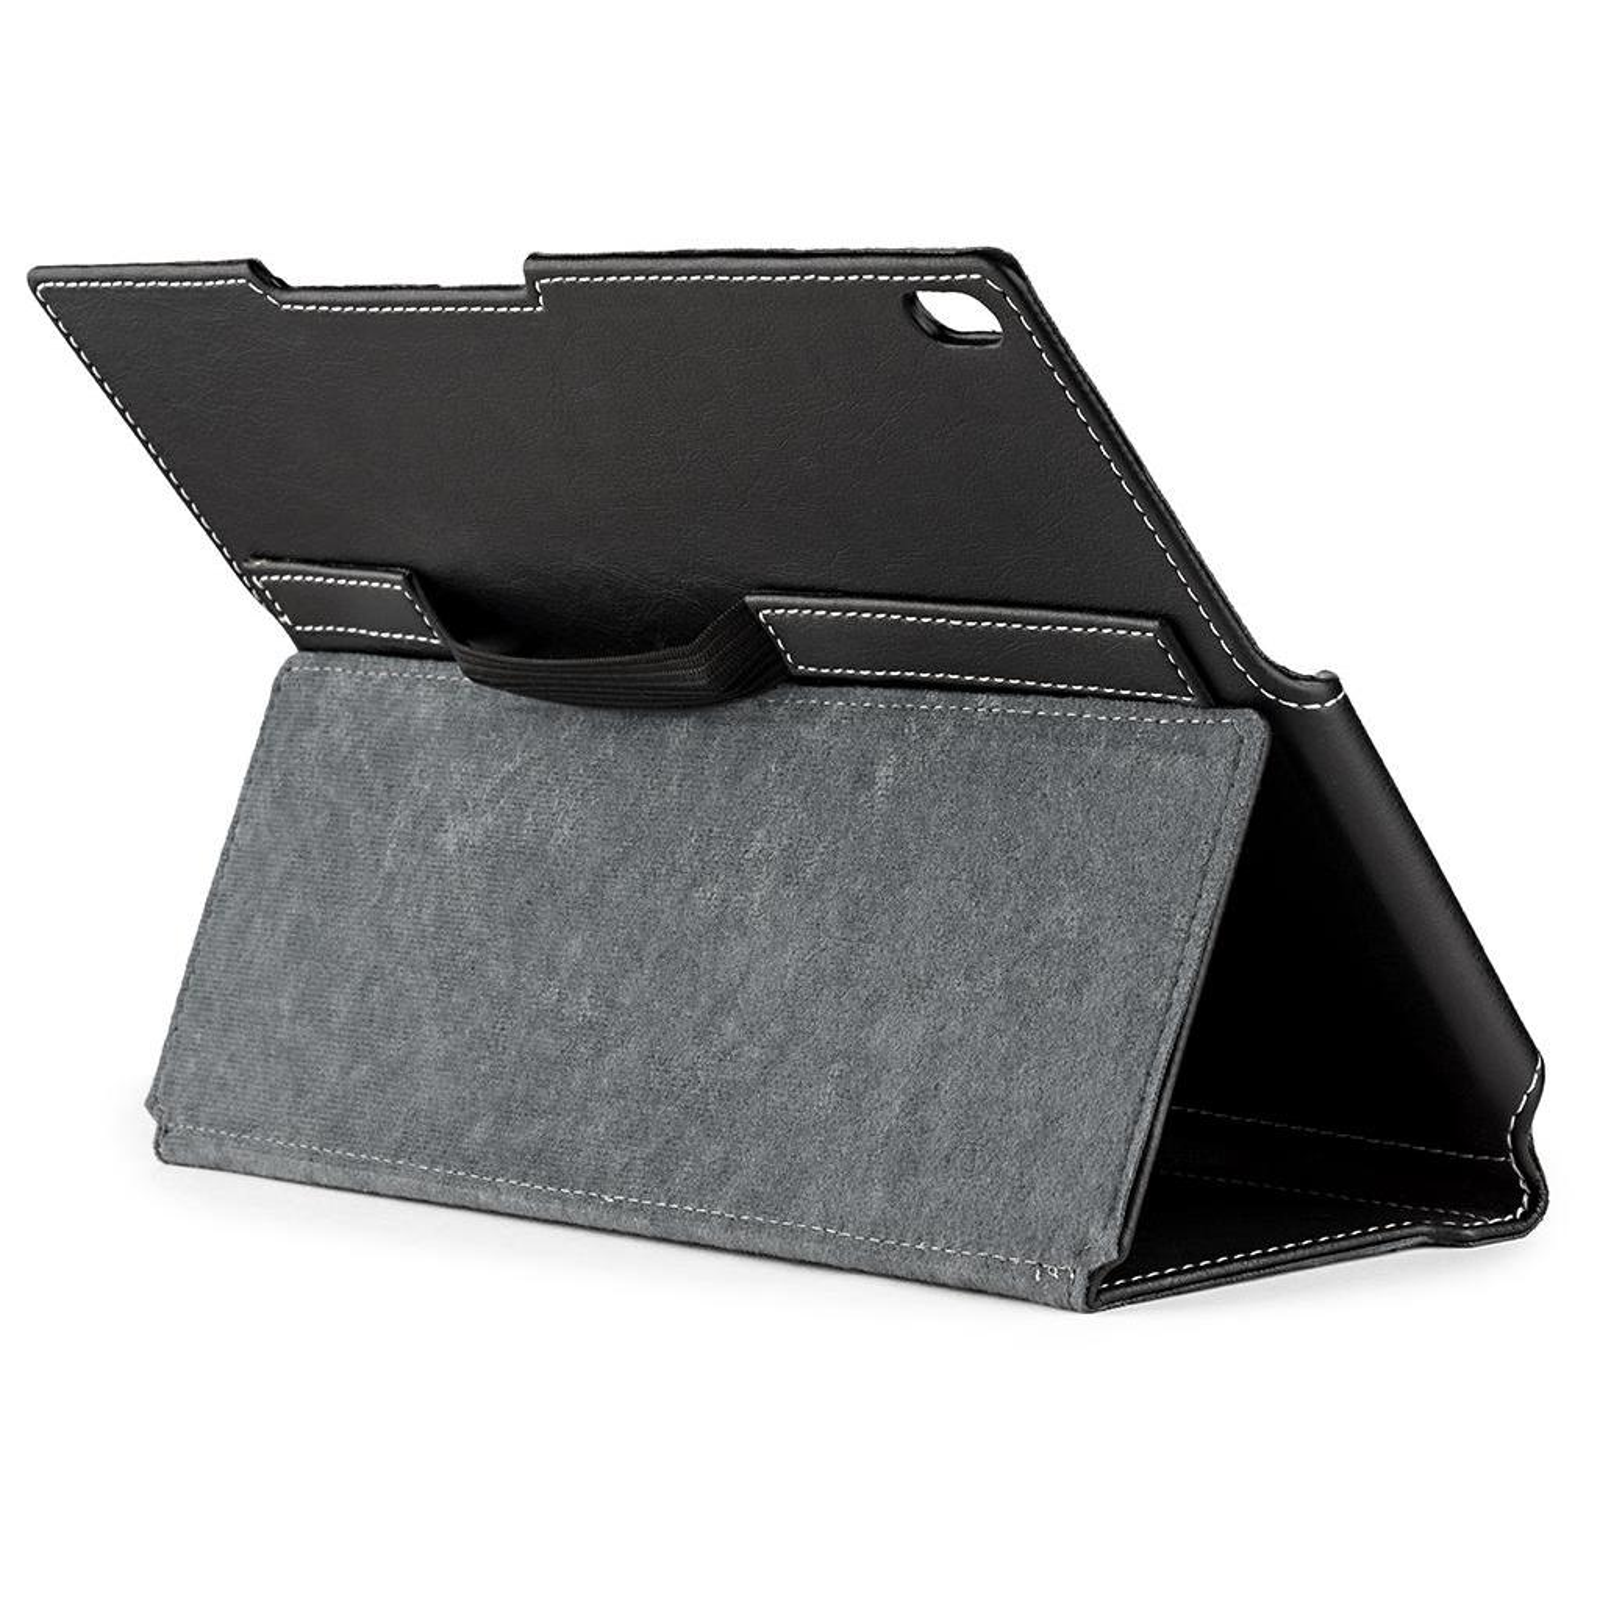 Чехол для планшета Lenovo Tab 4 10 LTE black Vinga (VNTB10LTE) изображение 5